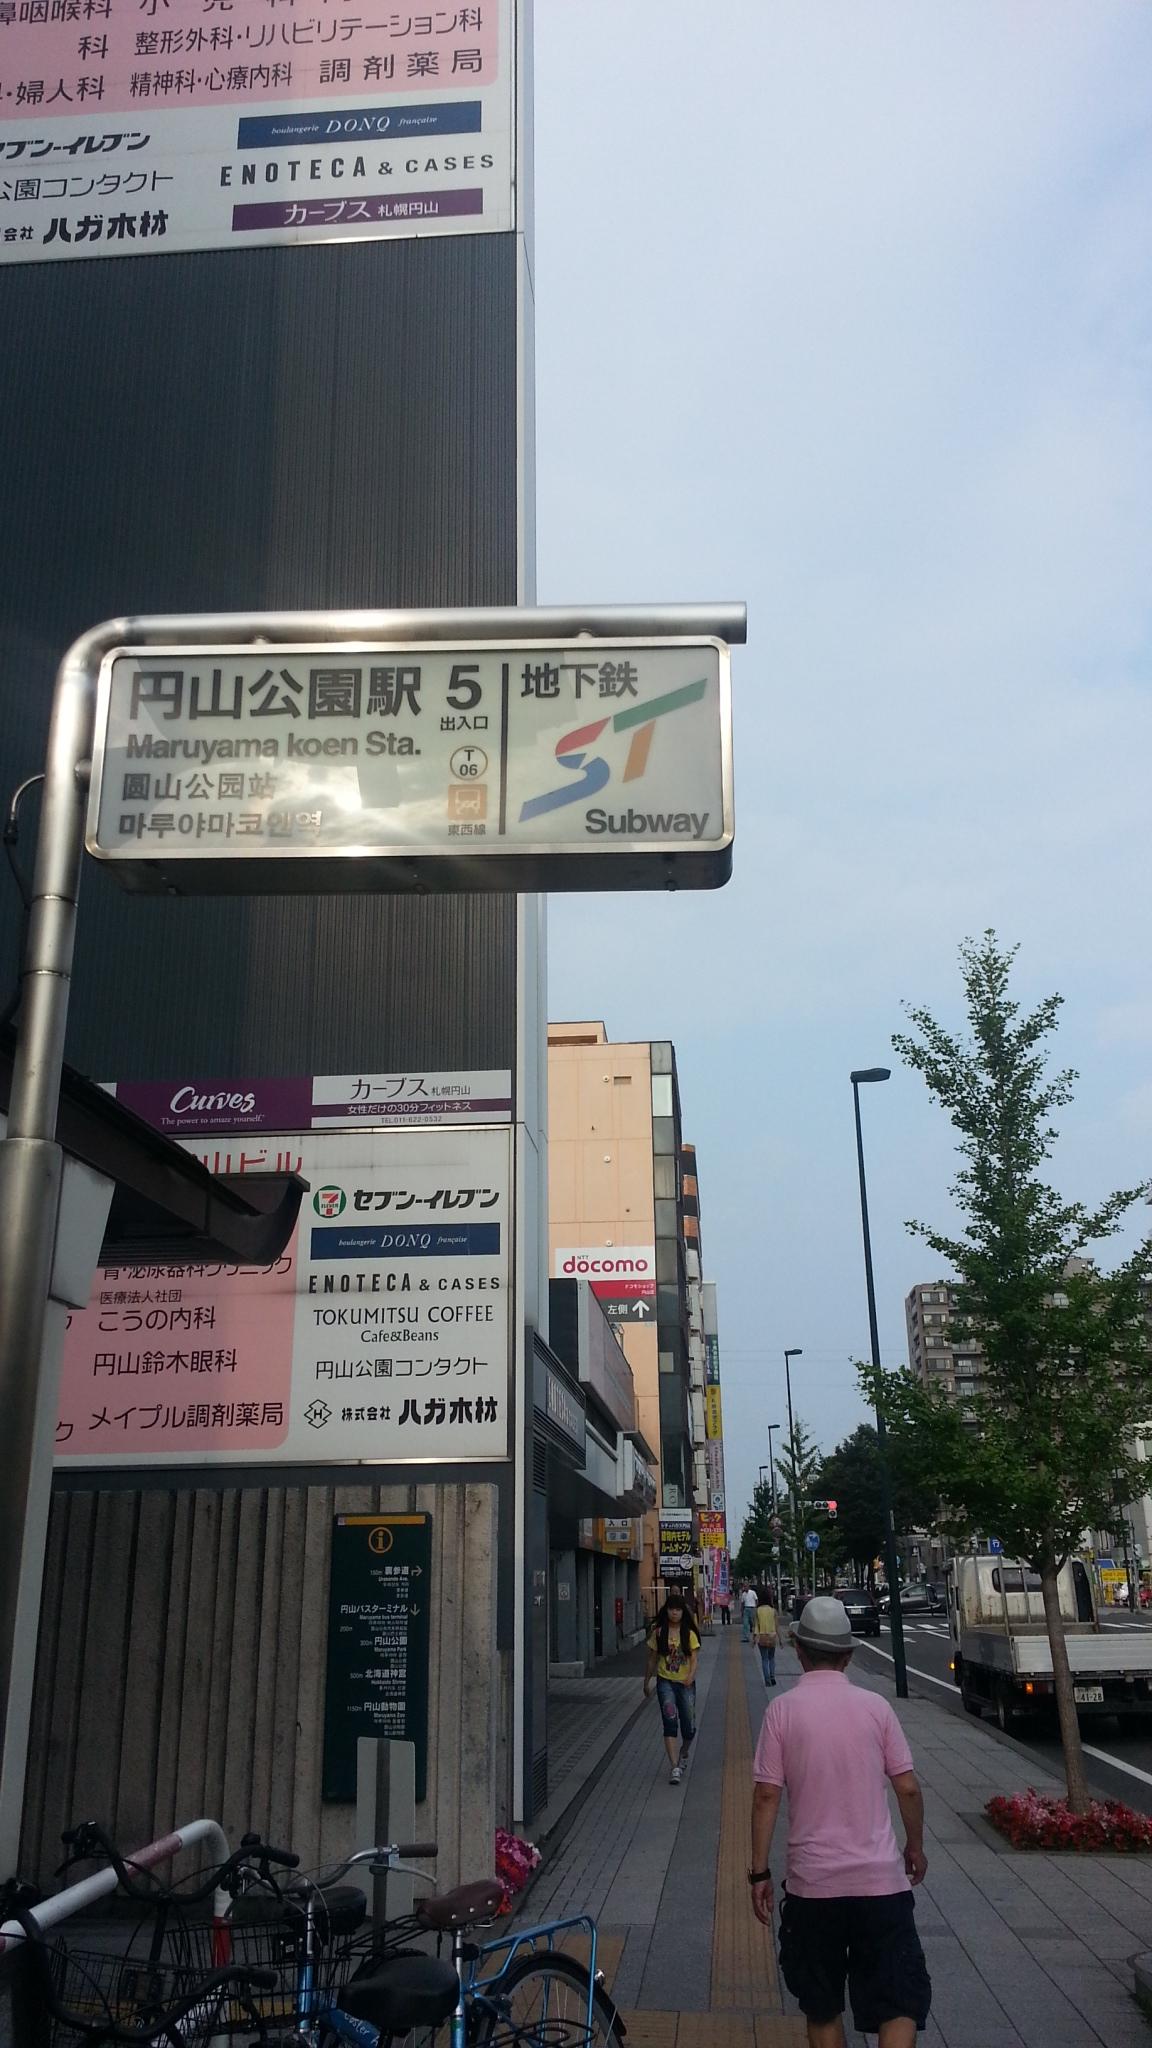 subway Maruyama http://www.ankh-jp.com